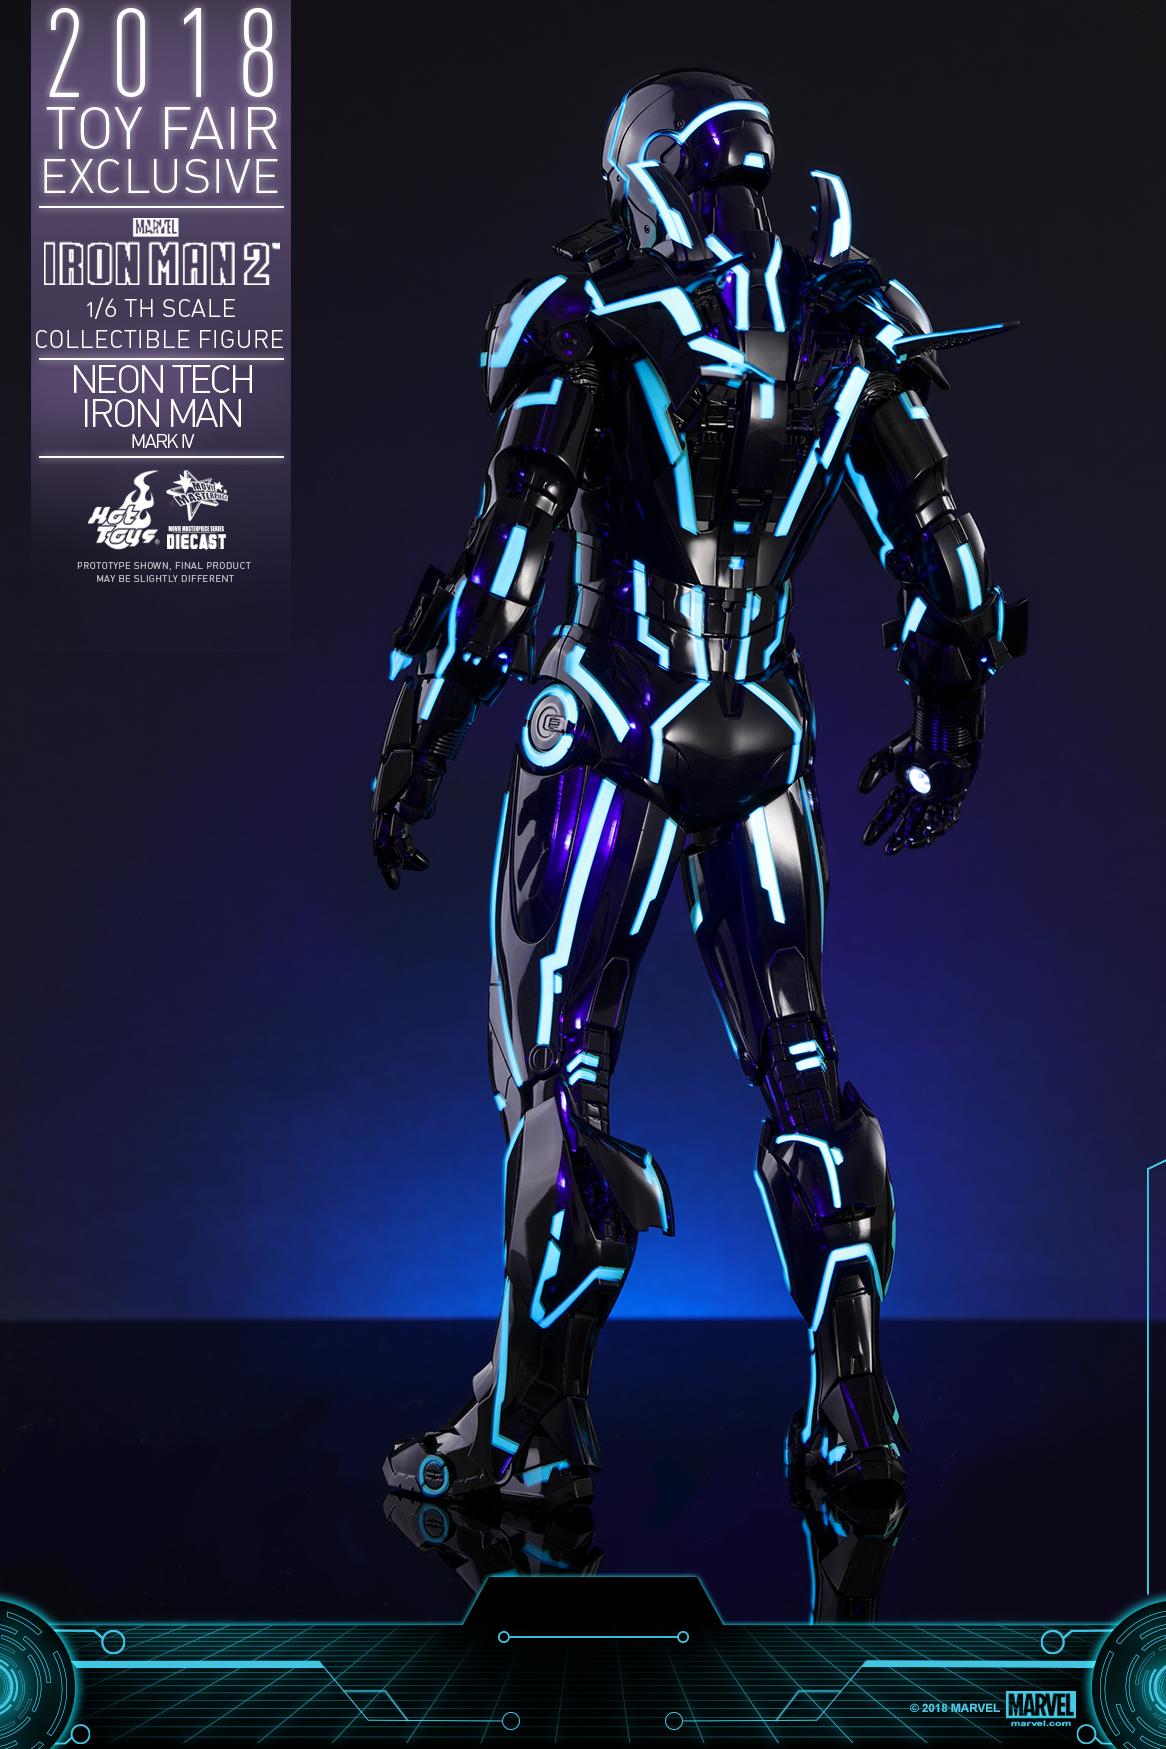 Hot Toys - Iron Man 2 - Neon Tech Iron Man Mark IV collectible figure_PR16